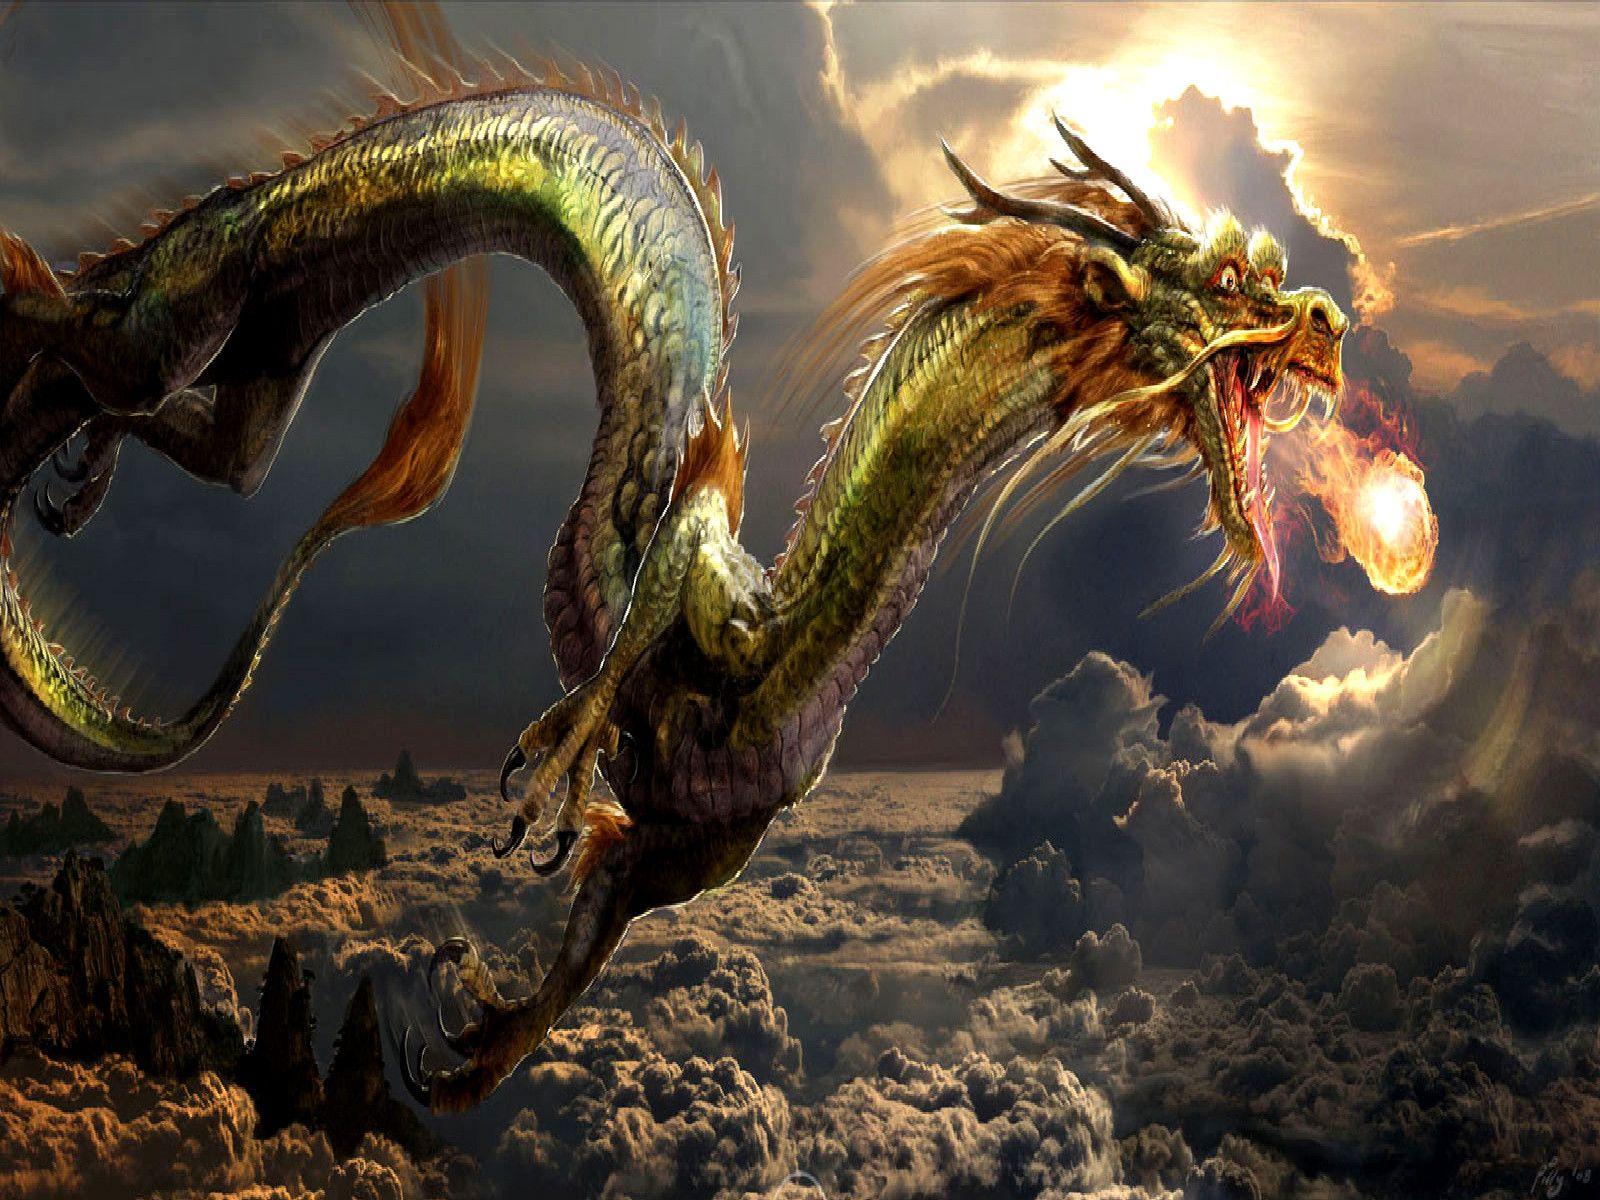 Dragon Screensavers And Wallpapers 1600x1200